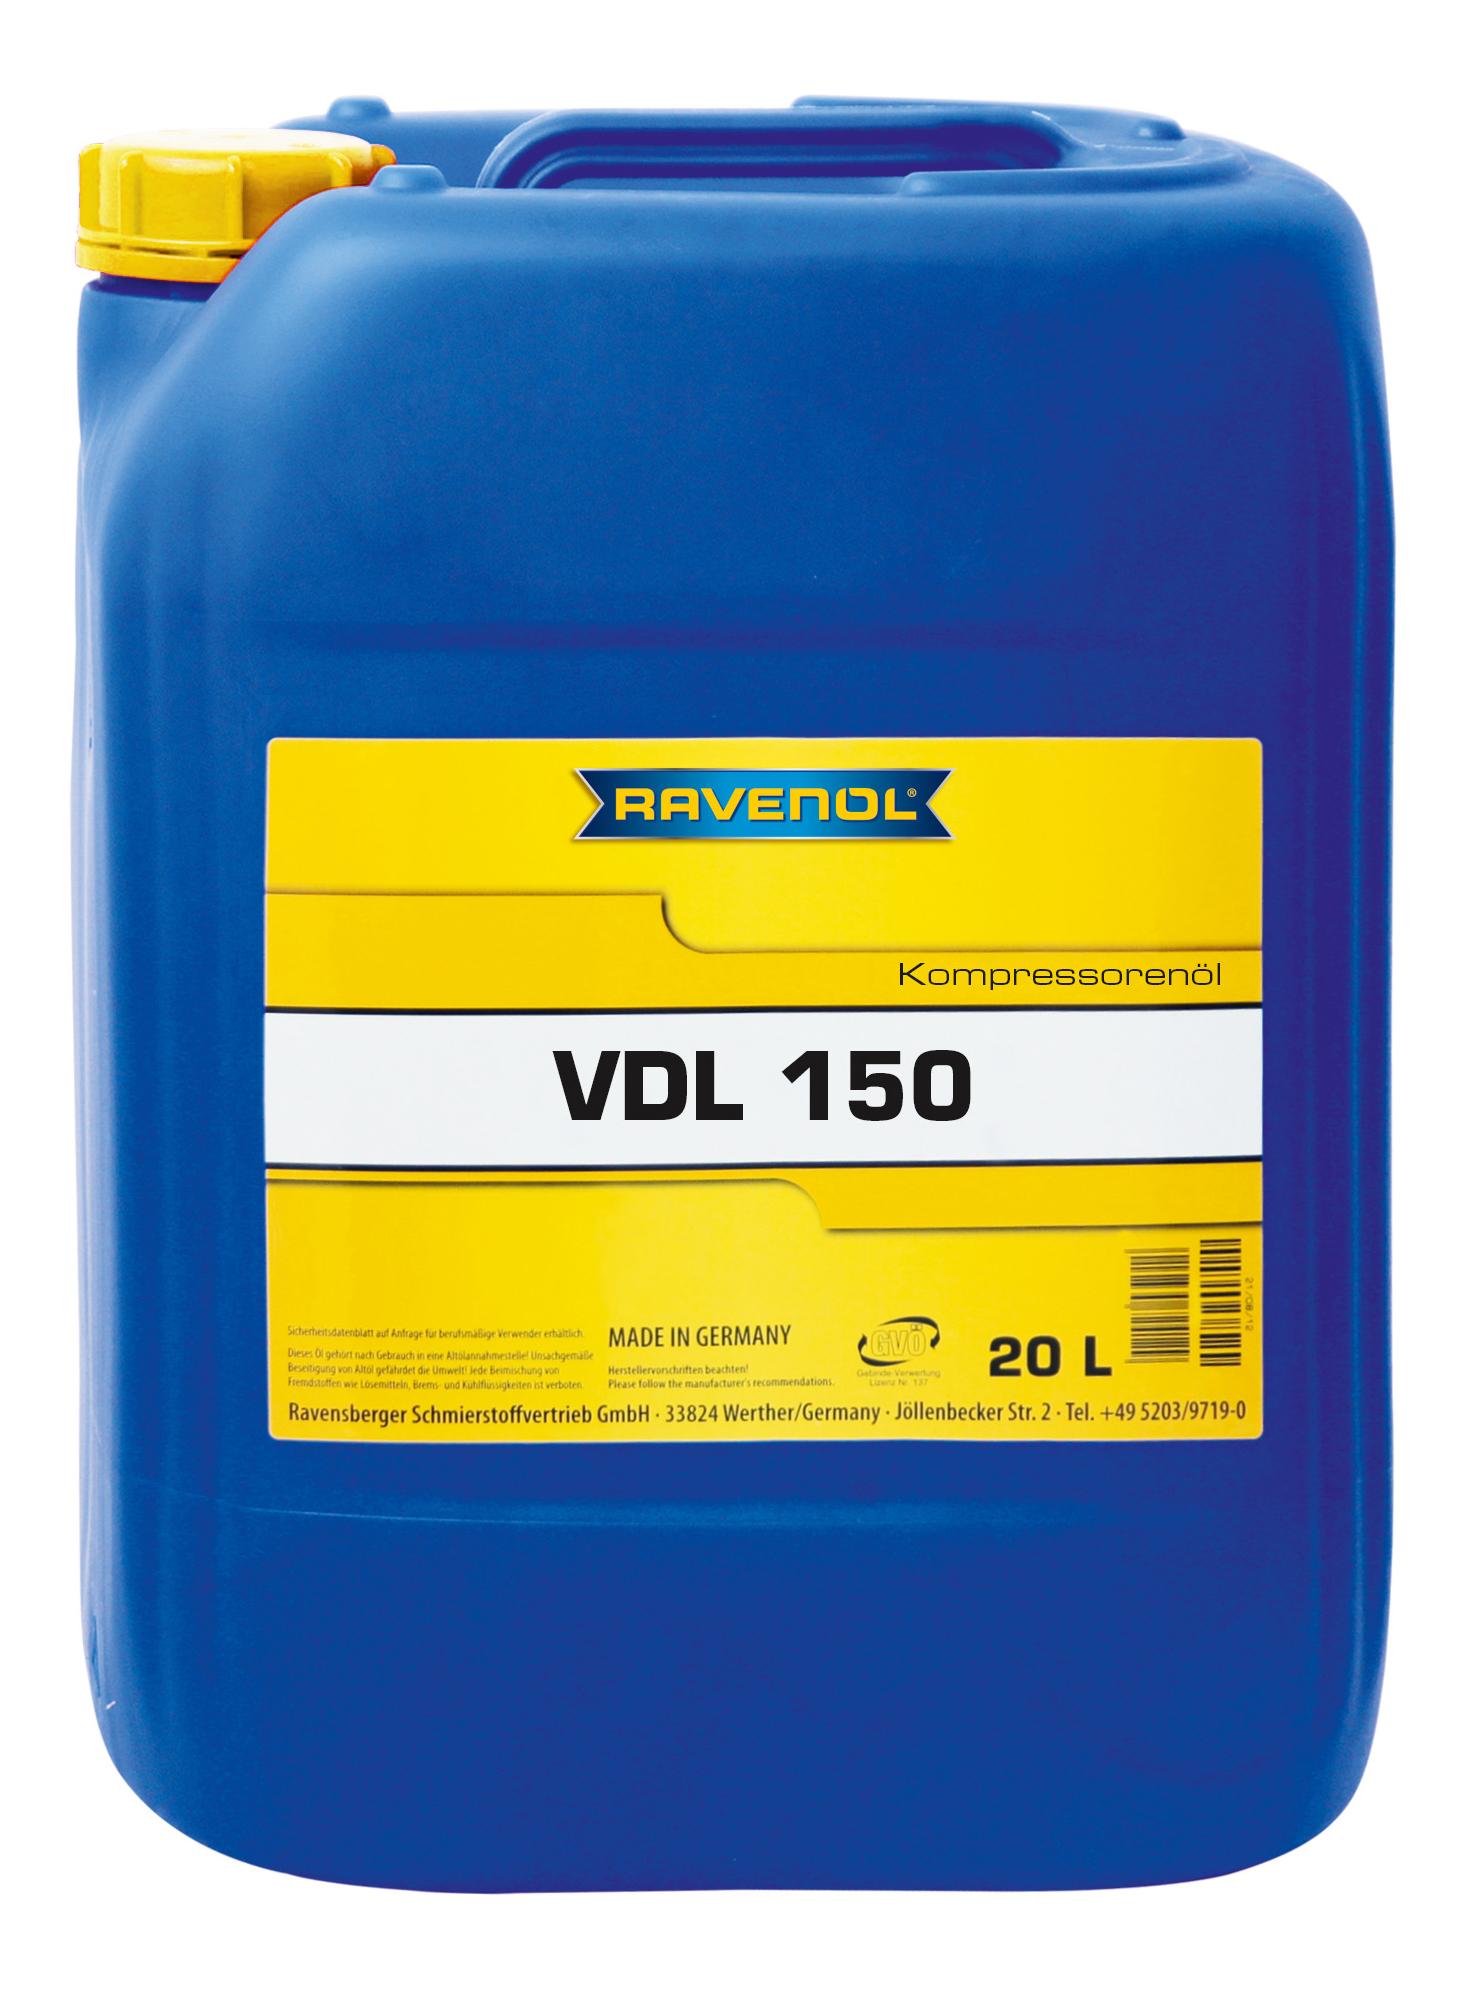 Компрессорное масло RAVENOL Kompressorenoel VDL 150 20л 1330101-020-01-999